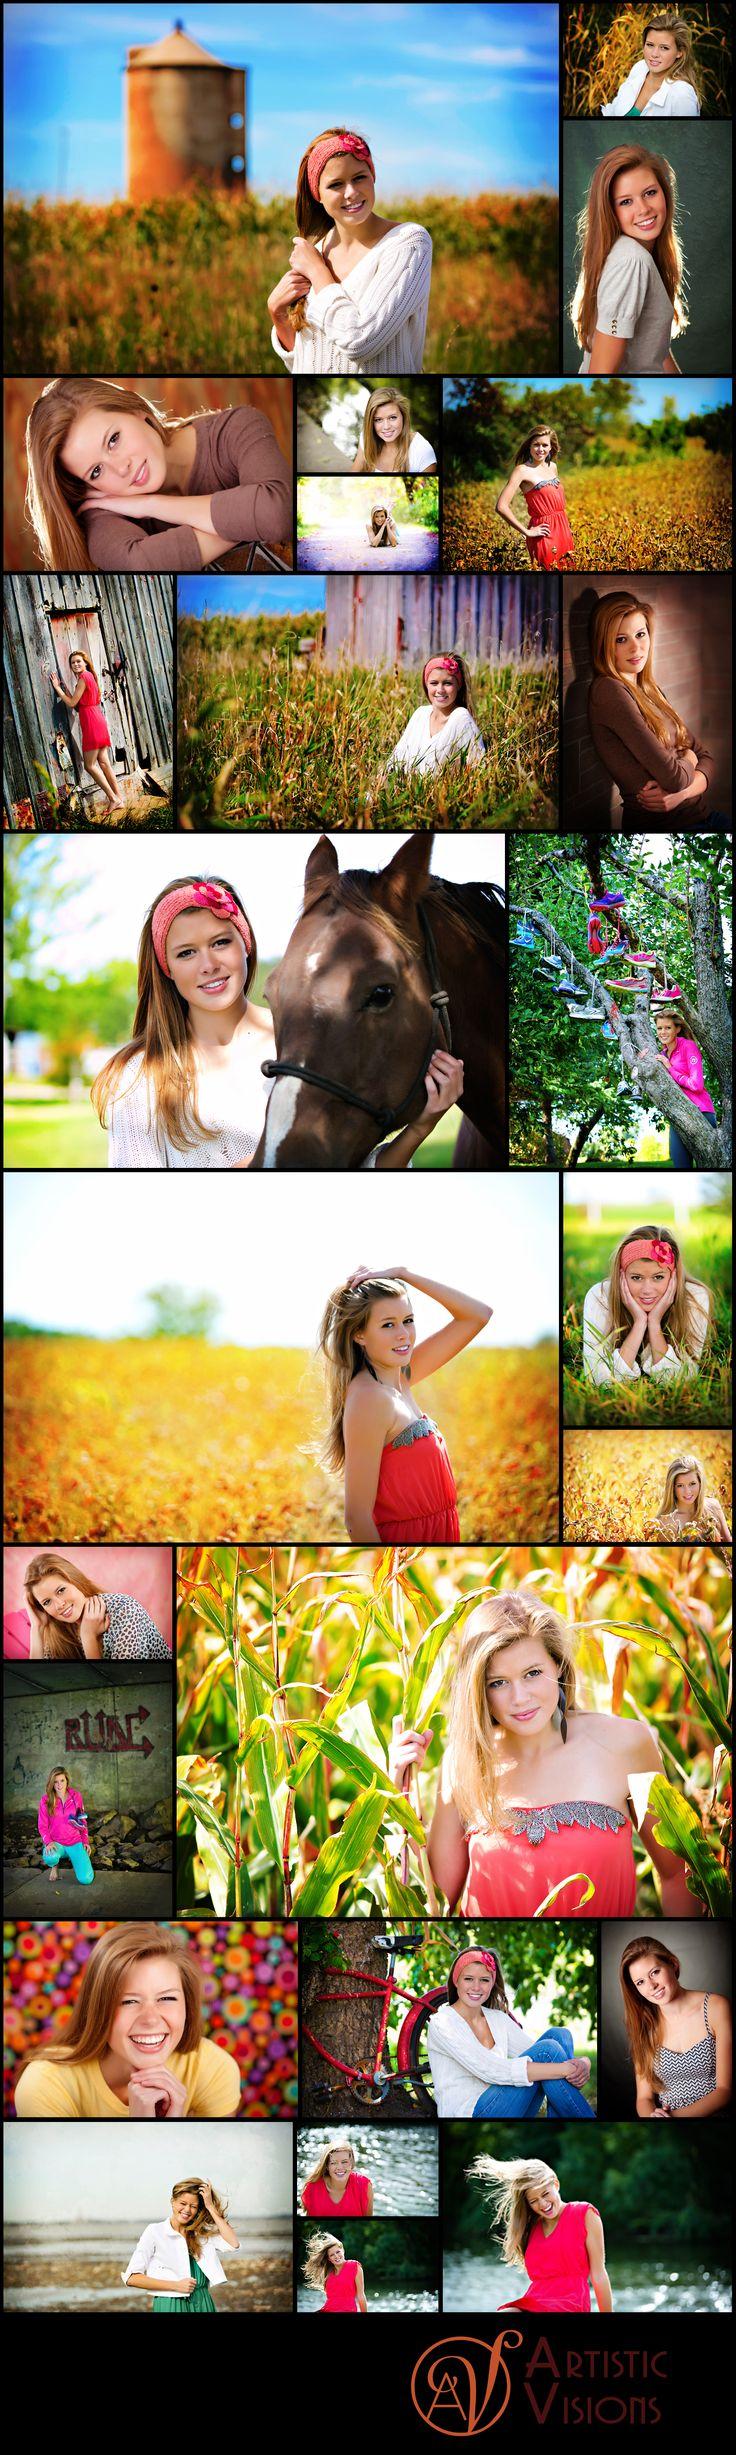 Abbie - Artistic Visions Green Bay Wisconsin Senior Portraits - Artistic Visions